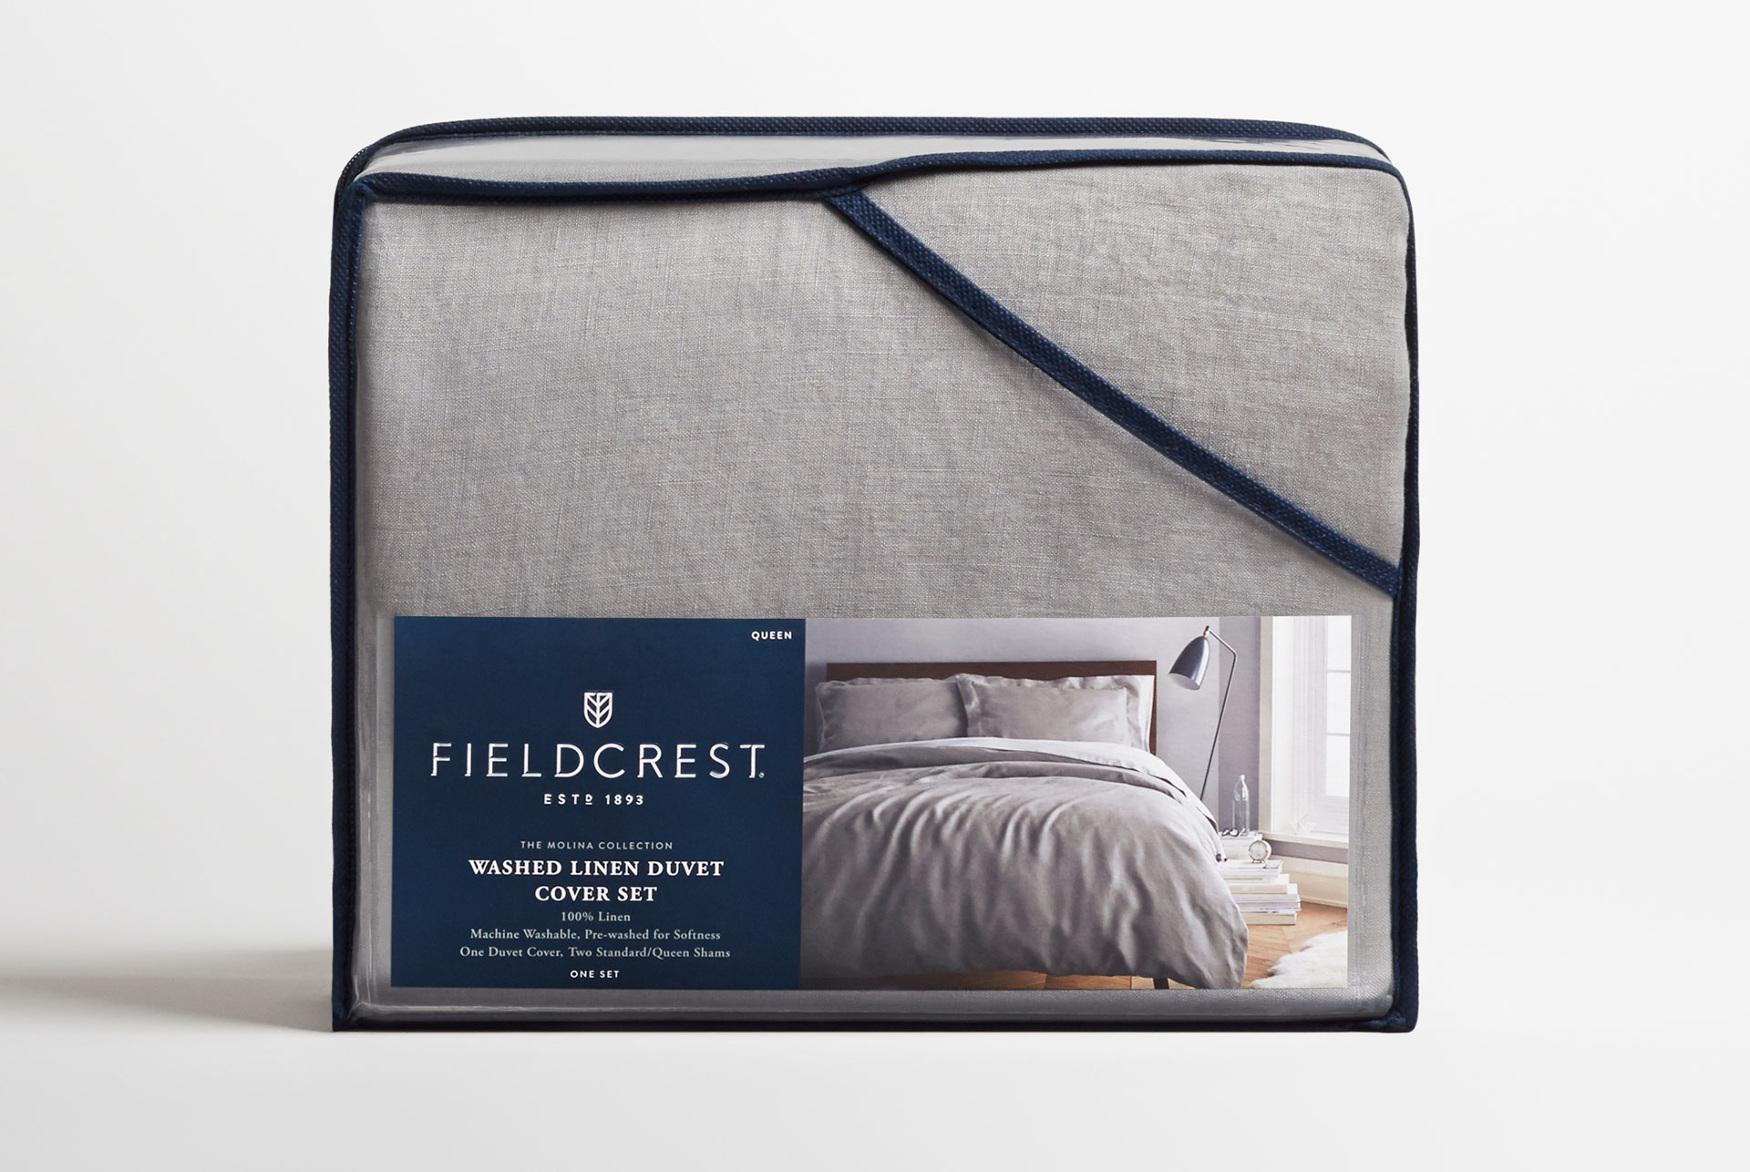 filed under identitytypographylogo index fieldcrest - Fieldcrest Bedding